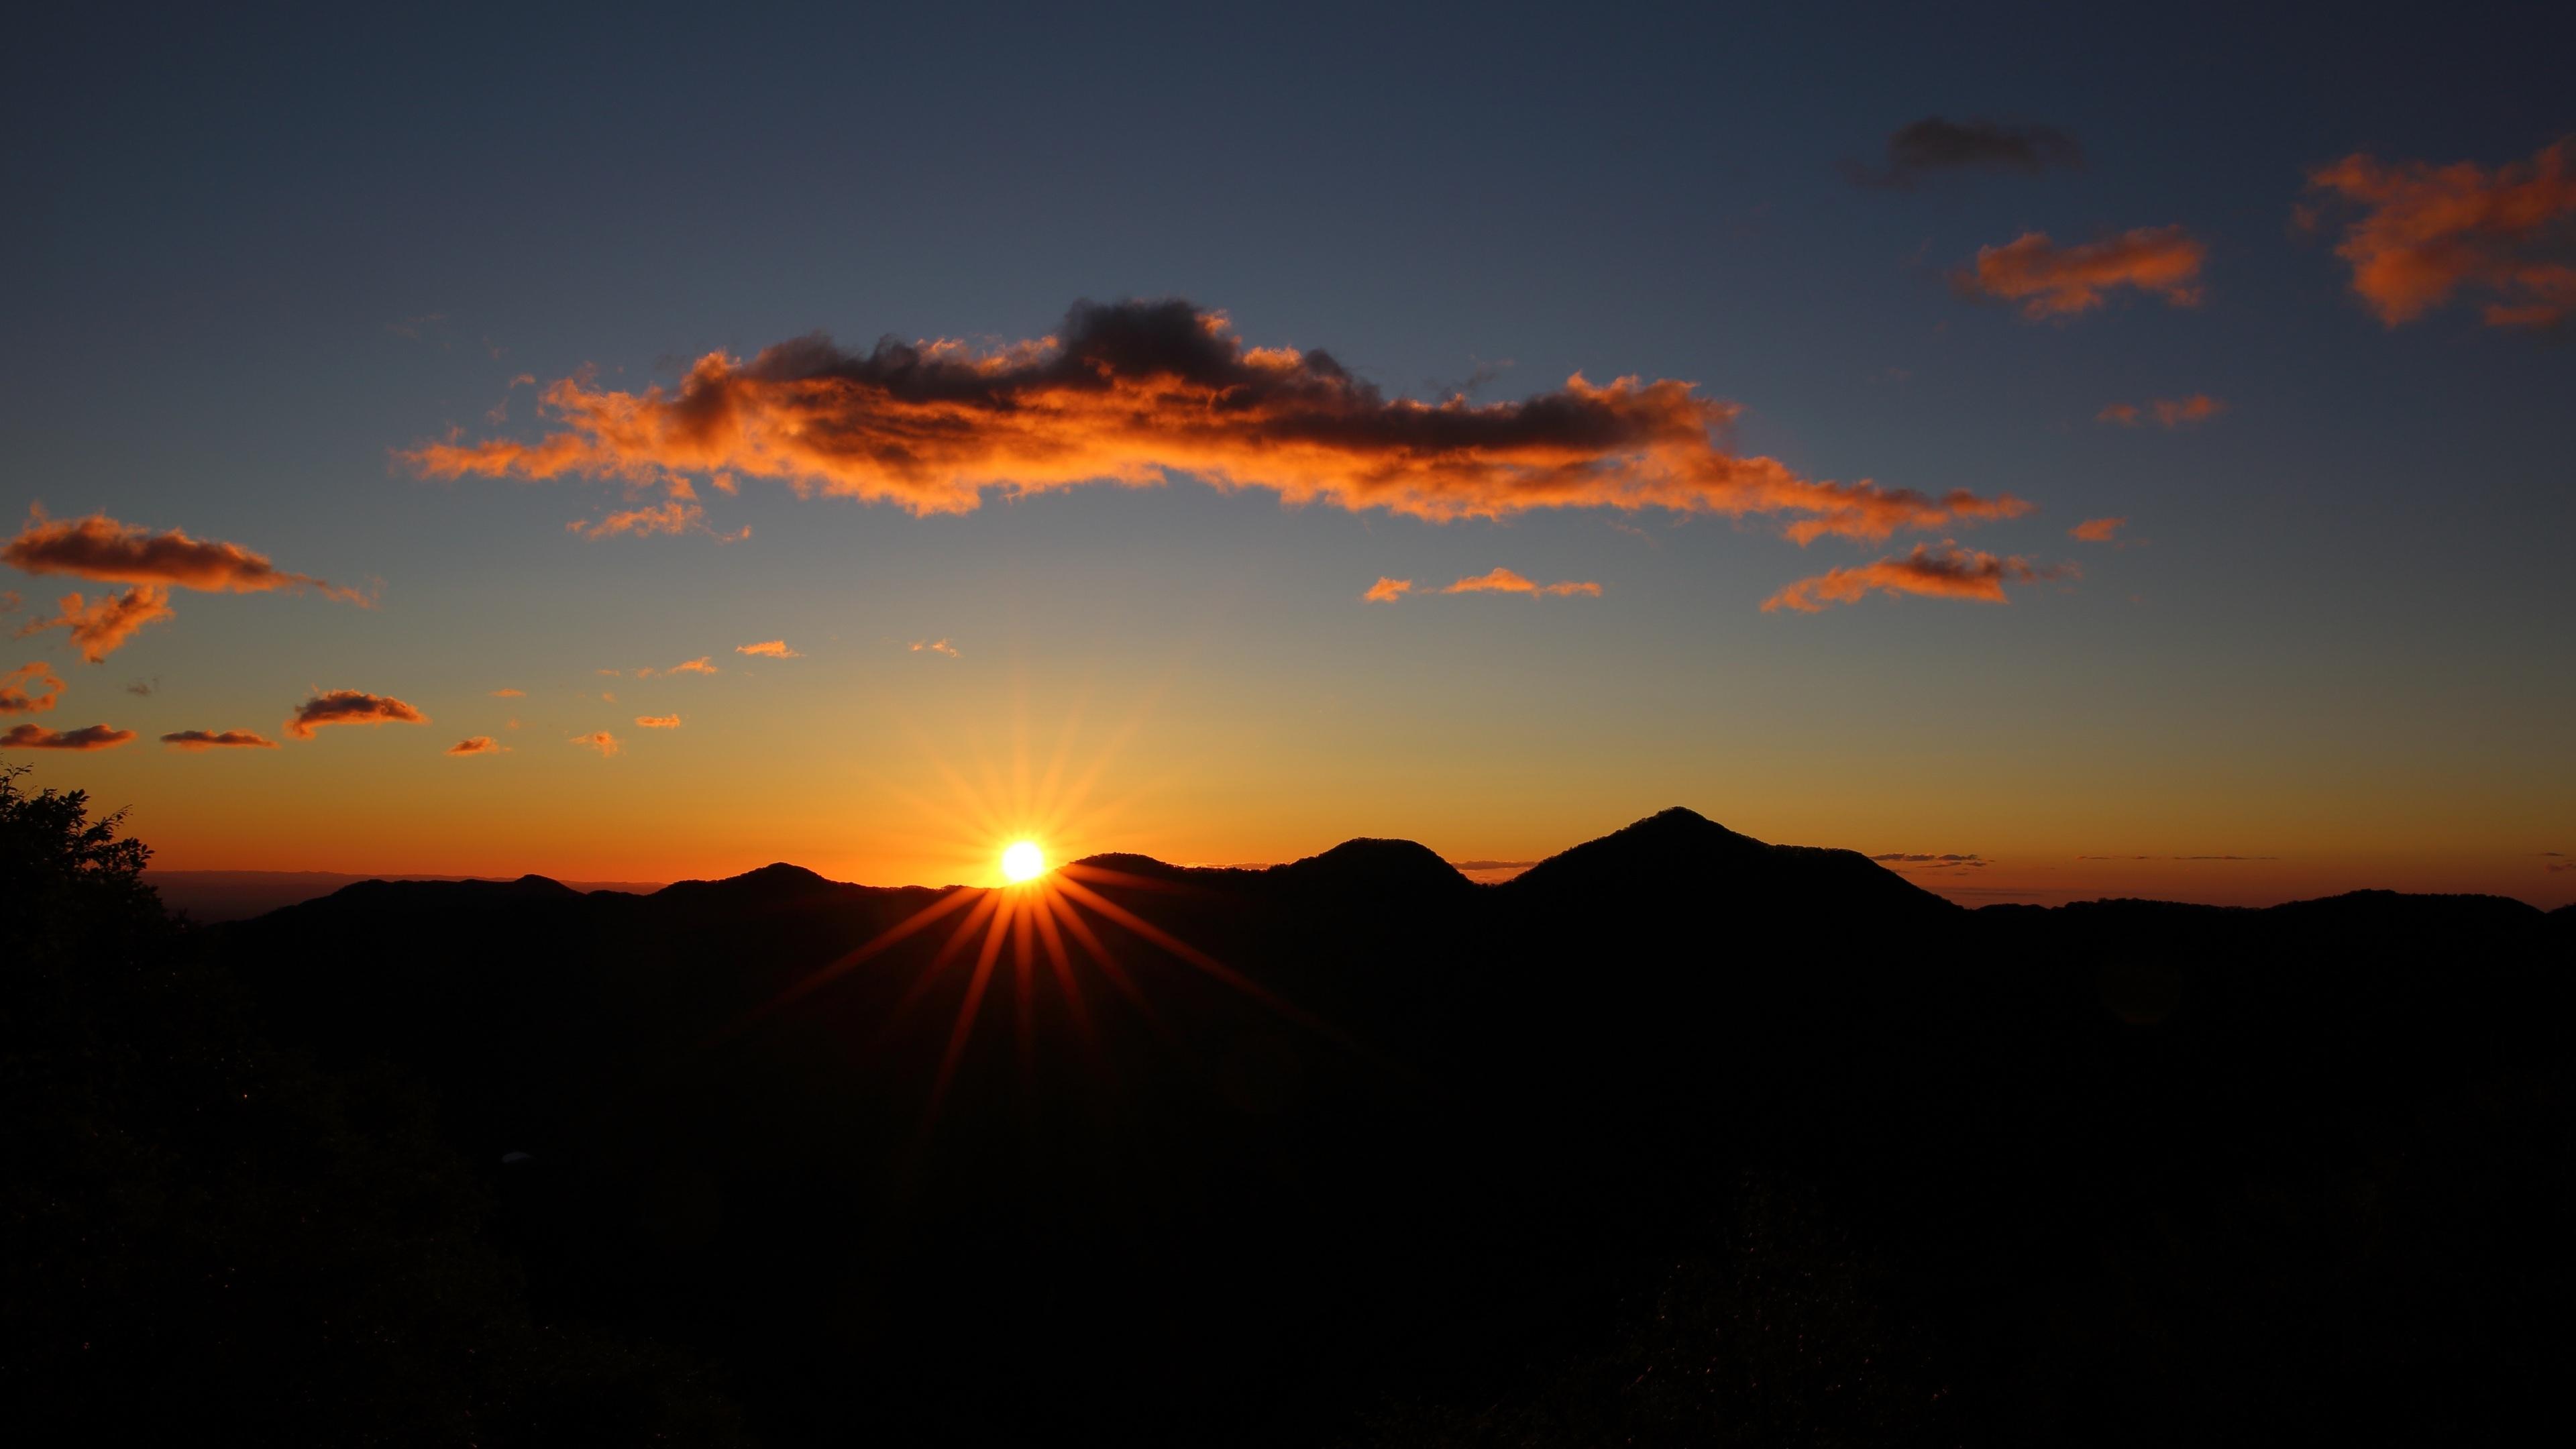 sunset sky hills silhouette 1540136625 - Sunset Sky Hills Silhouette - sunset wallpapers, sky wallpapers, silhouette wallpapers, nature wallpapers, hd-wallpapers, 5k wallpapers, 4k-wallpapers